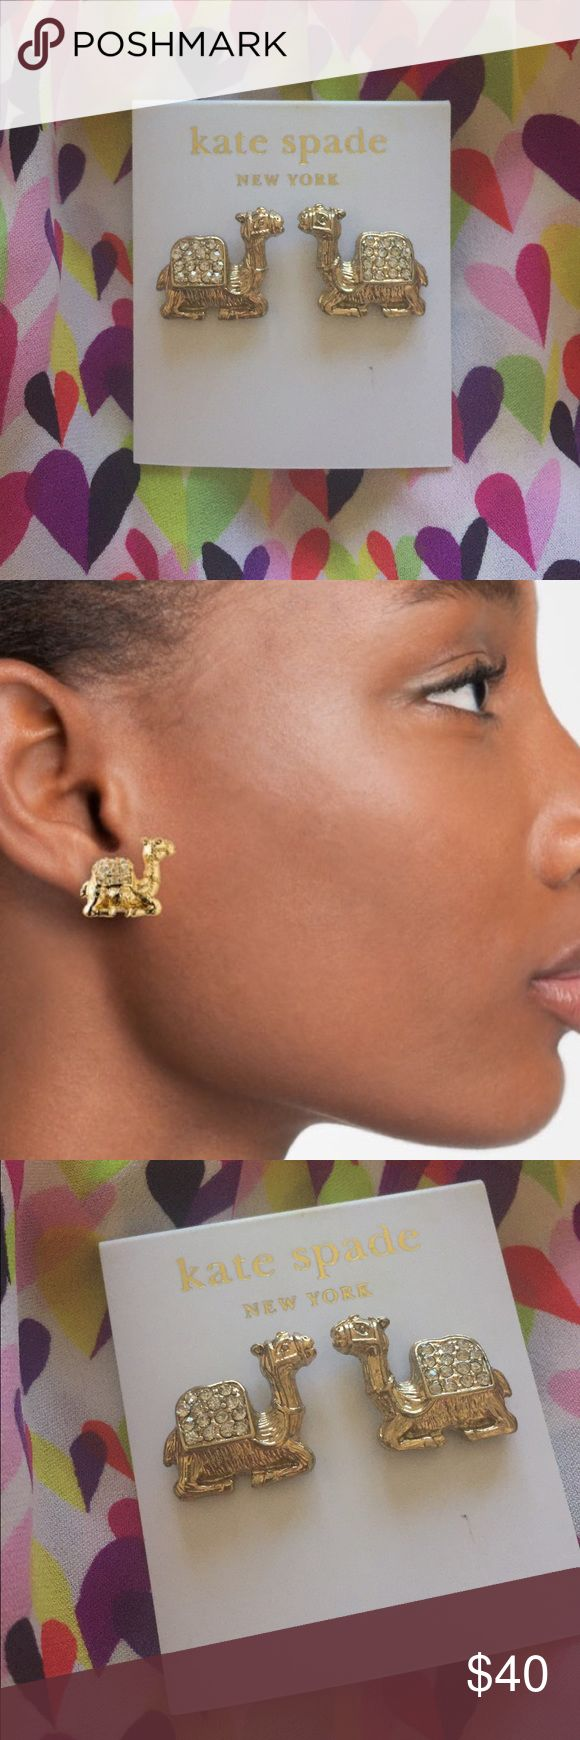 Kate Spade 🐫 camel earrings! 🐫 So stinkin cute and hard to find! kate spade Jewelry Earrings